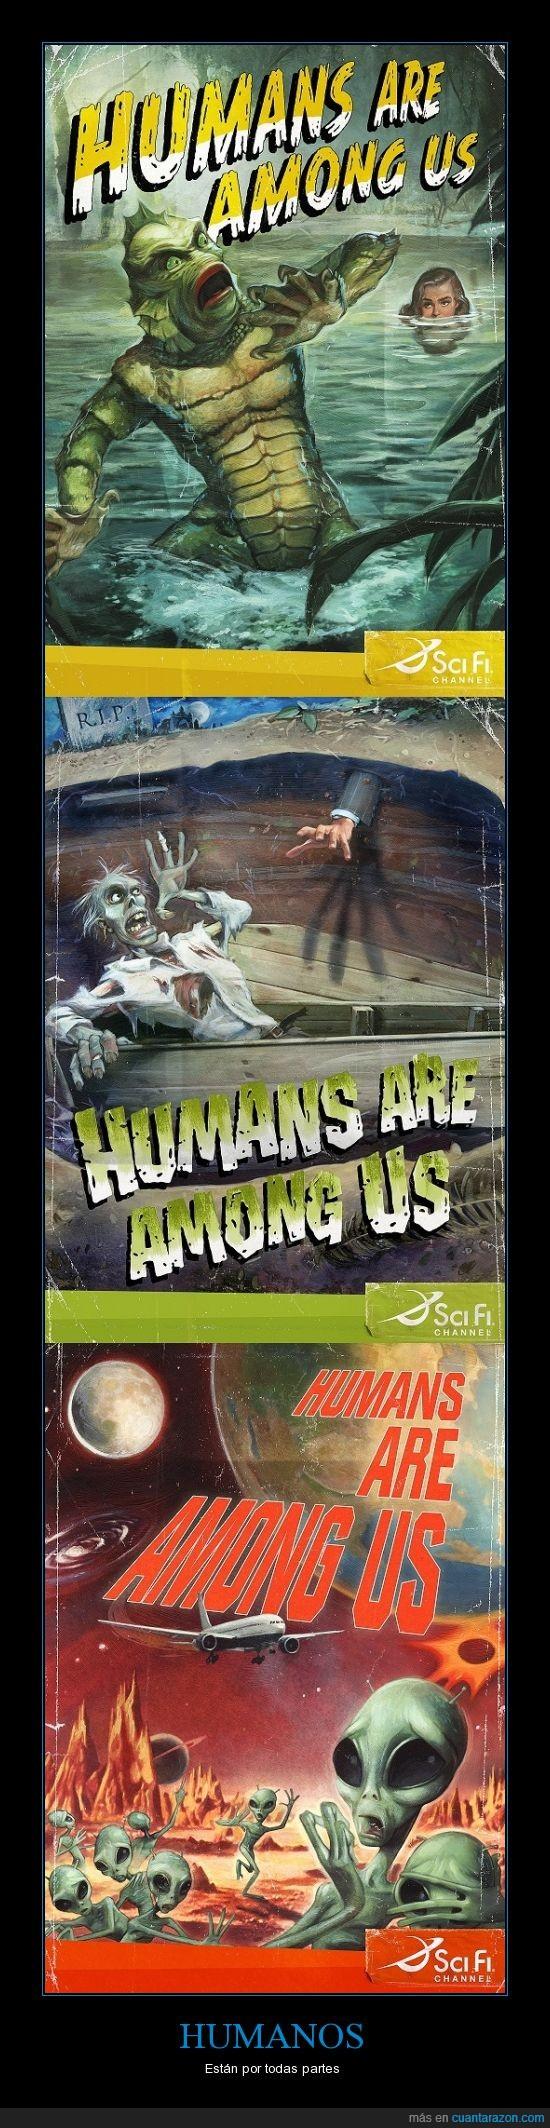 alienigenas,están por todas partes,humanos,monstruos,nos atacan,zombies